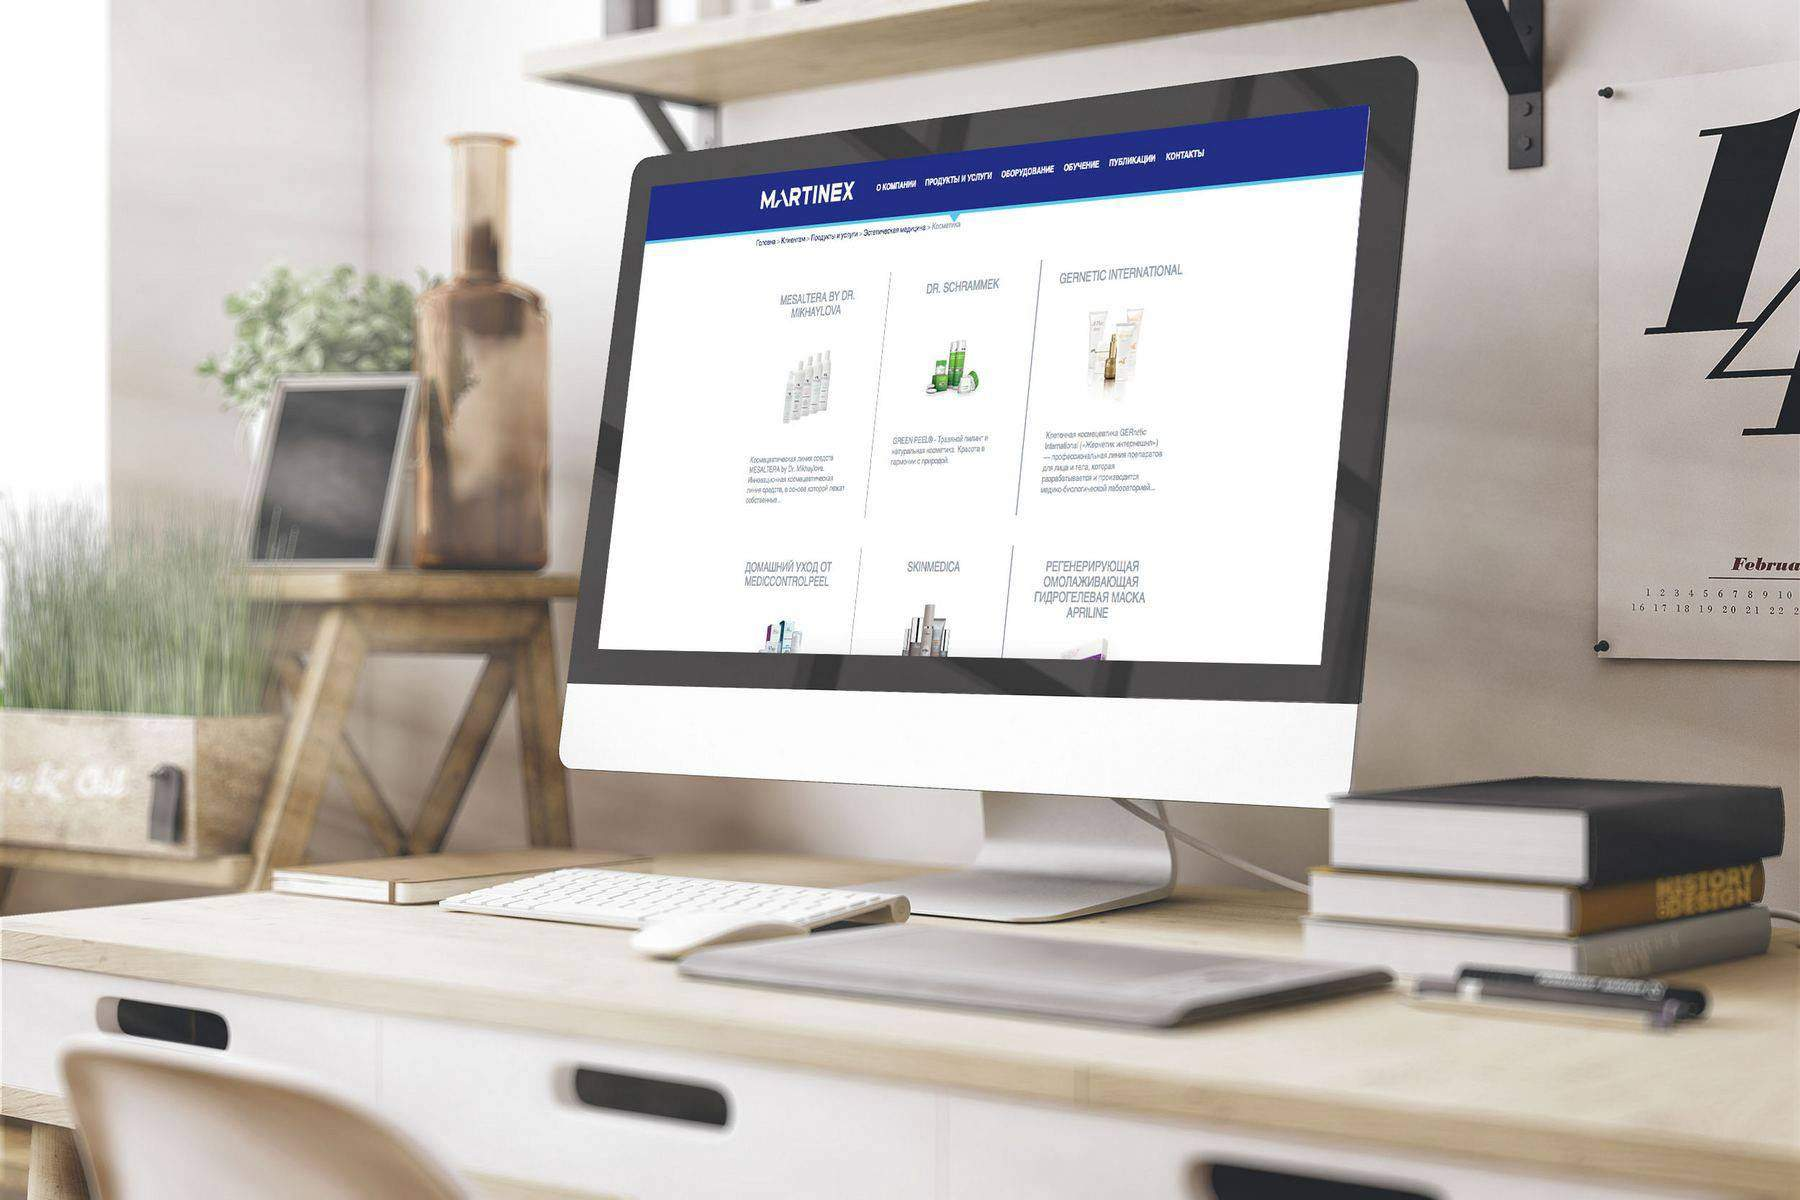 Разработка корпоративного веб сайта для компании Martinex портфолио